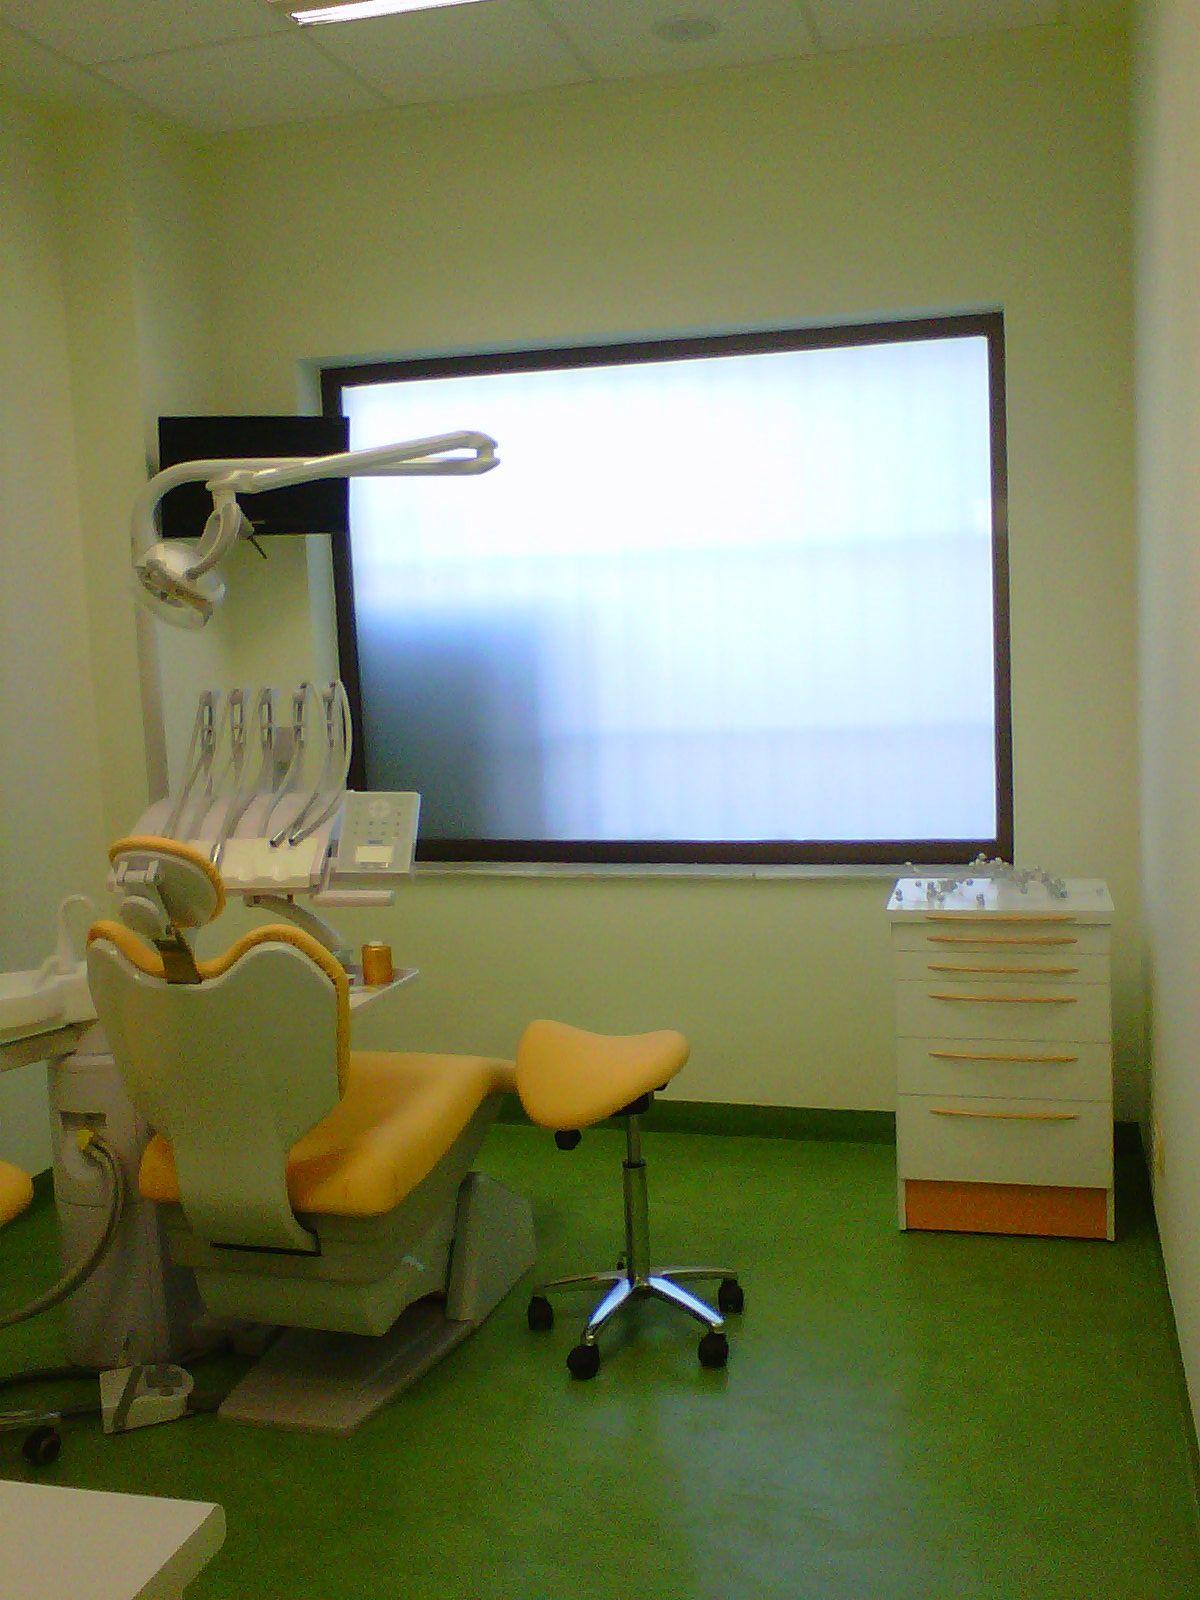 Foto 15 de Dentistas en Avilés | Centro Dental Innova